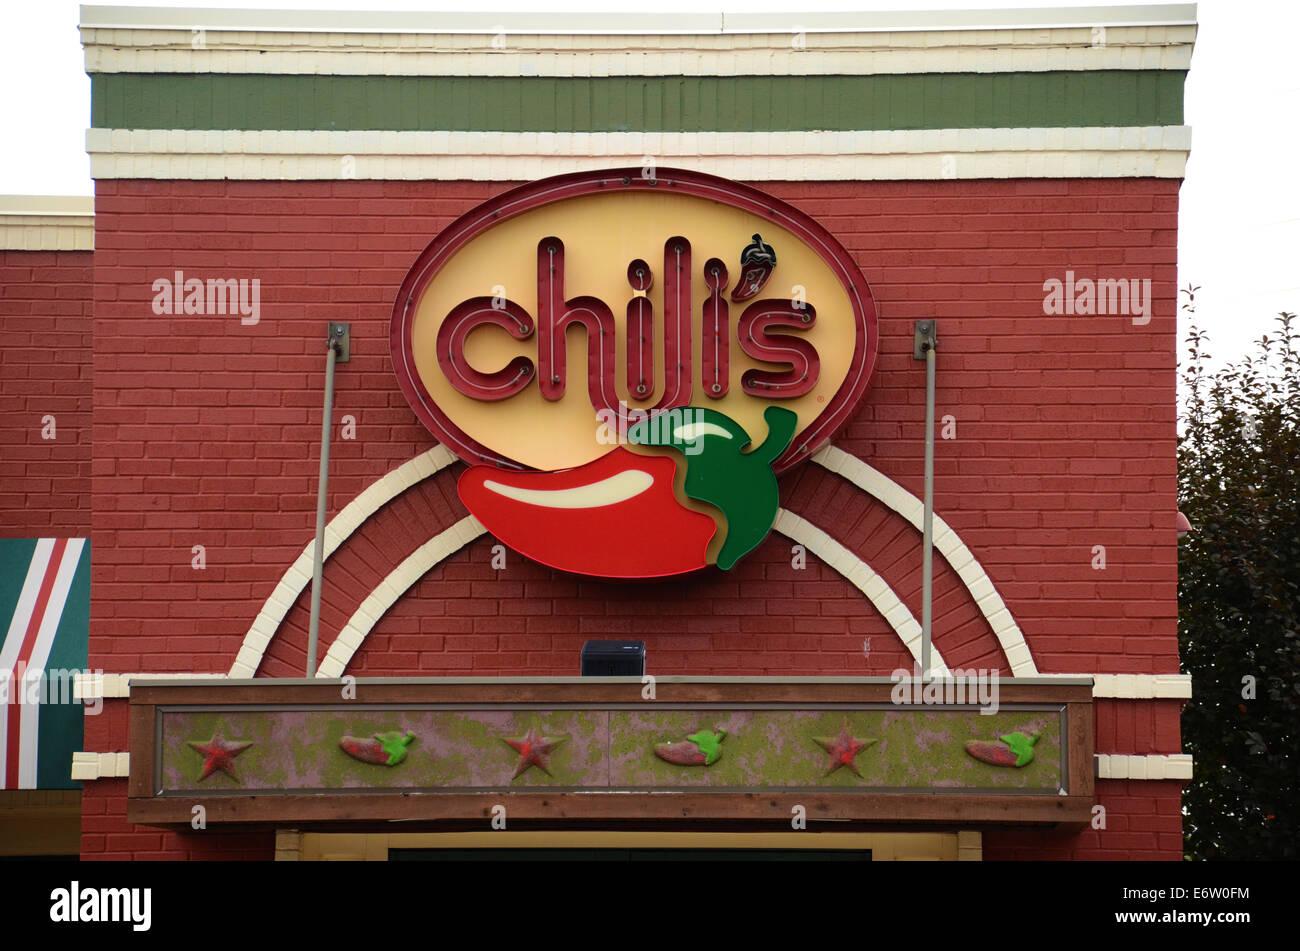 ANN ARBOR, MI - Agosto 24: Chili's East Ann Arbor Store logo aparece el 24 de agosto de 2014. Foto de stock